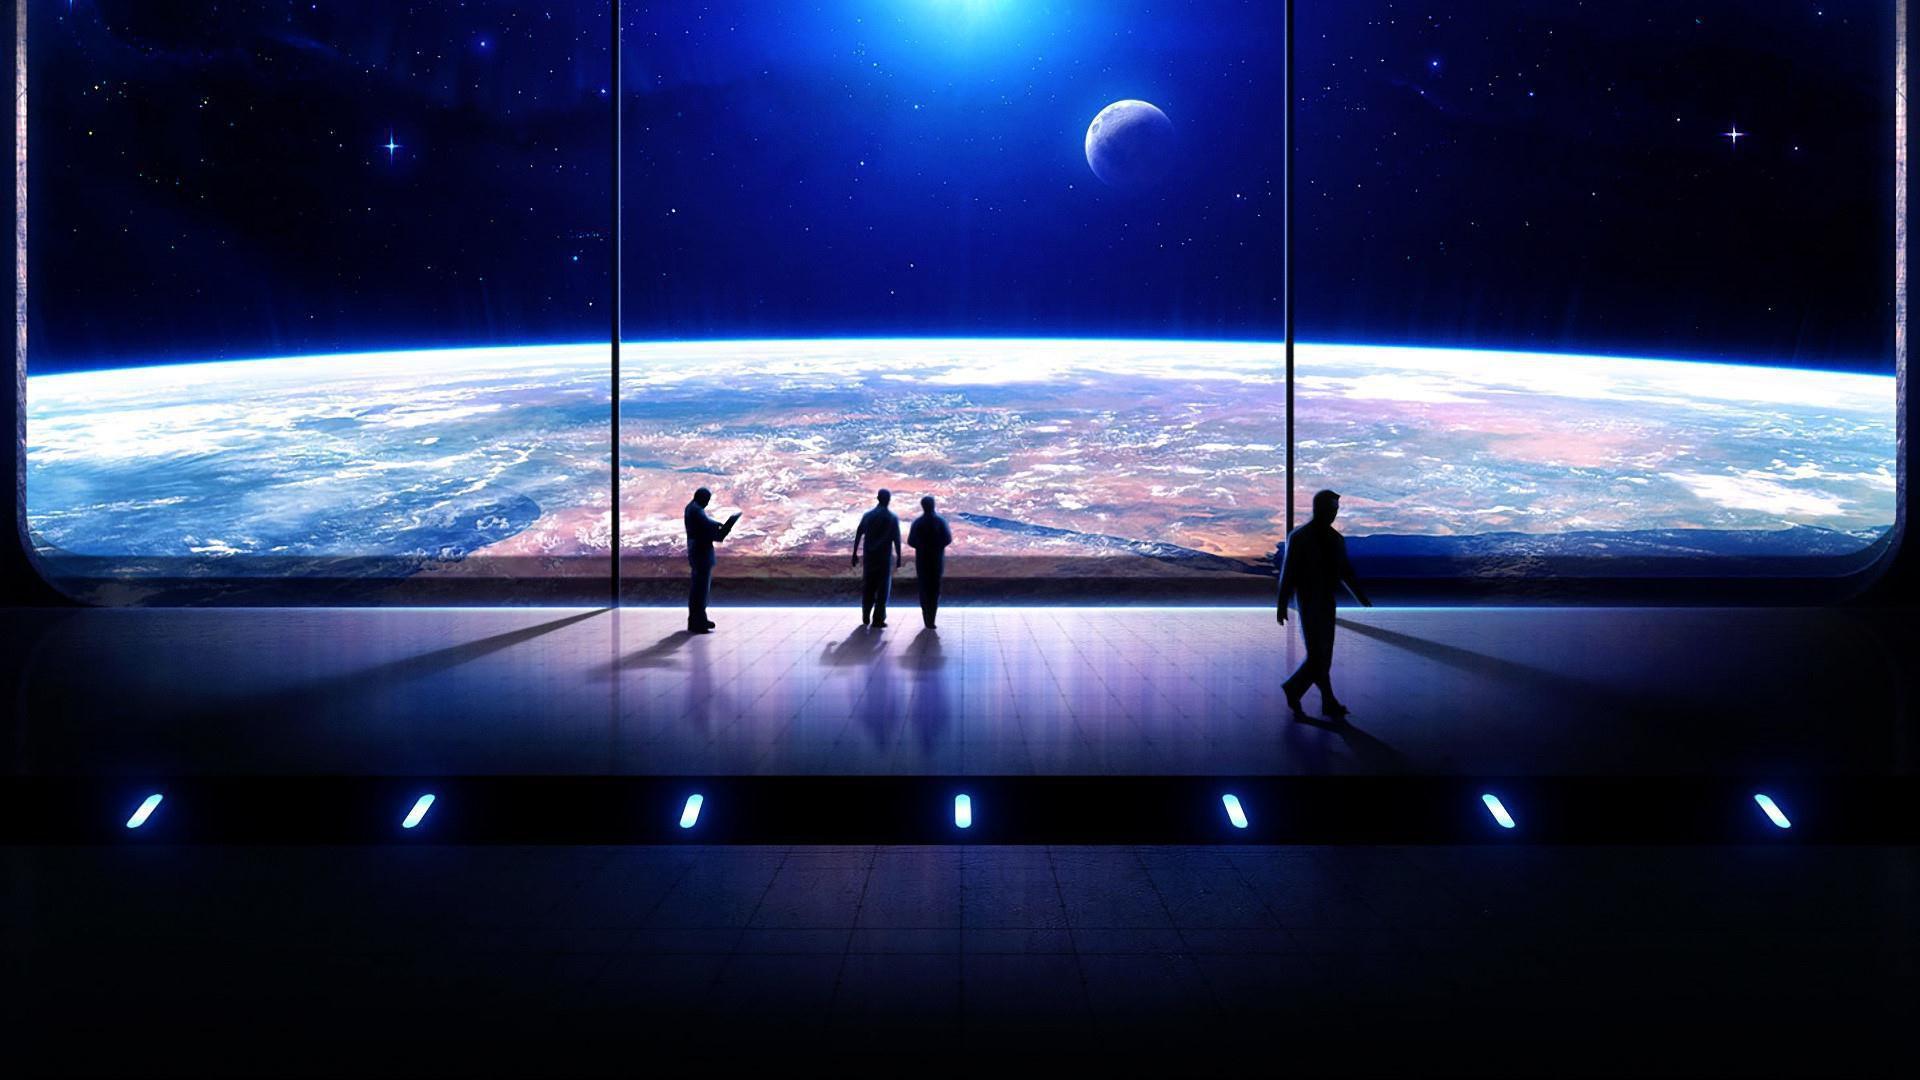 2001 a space odyssey nude